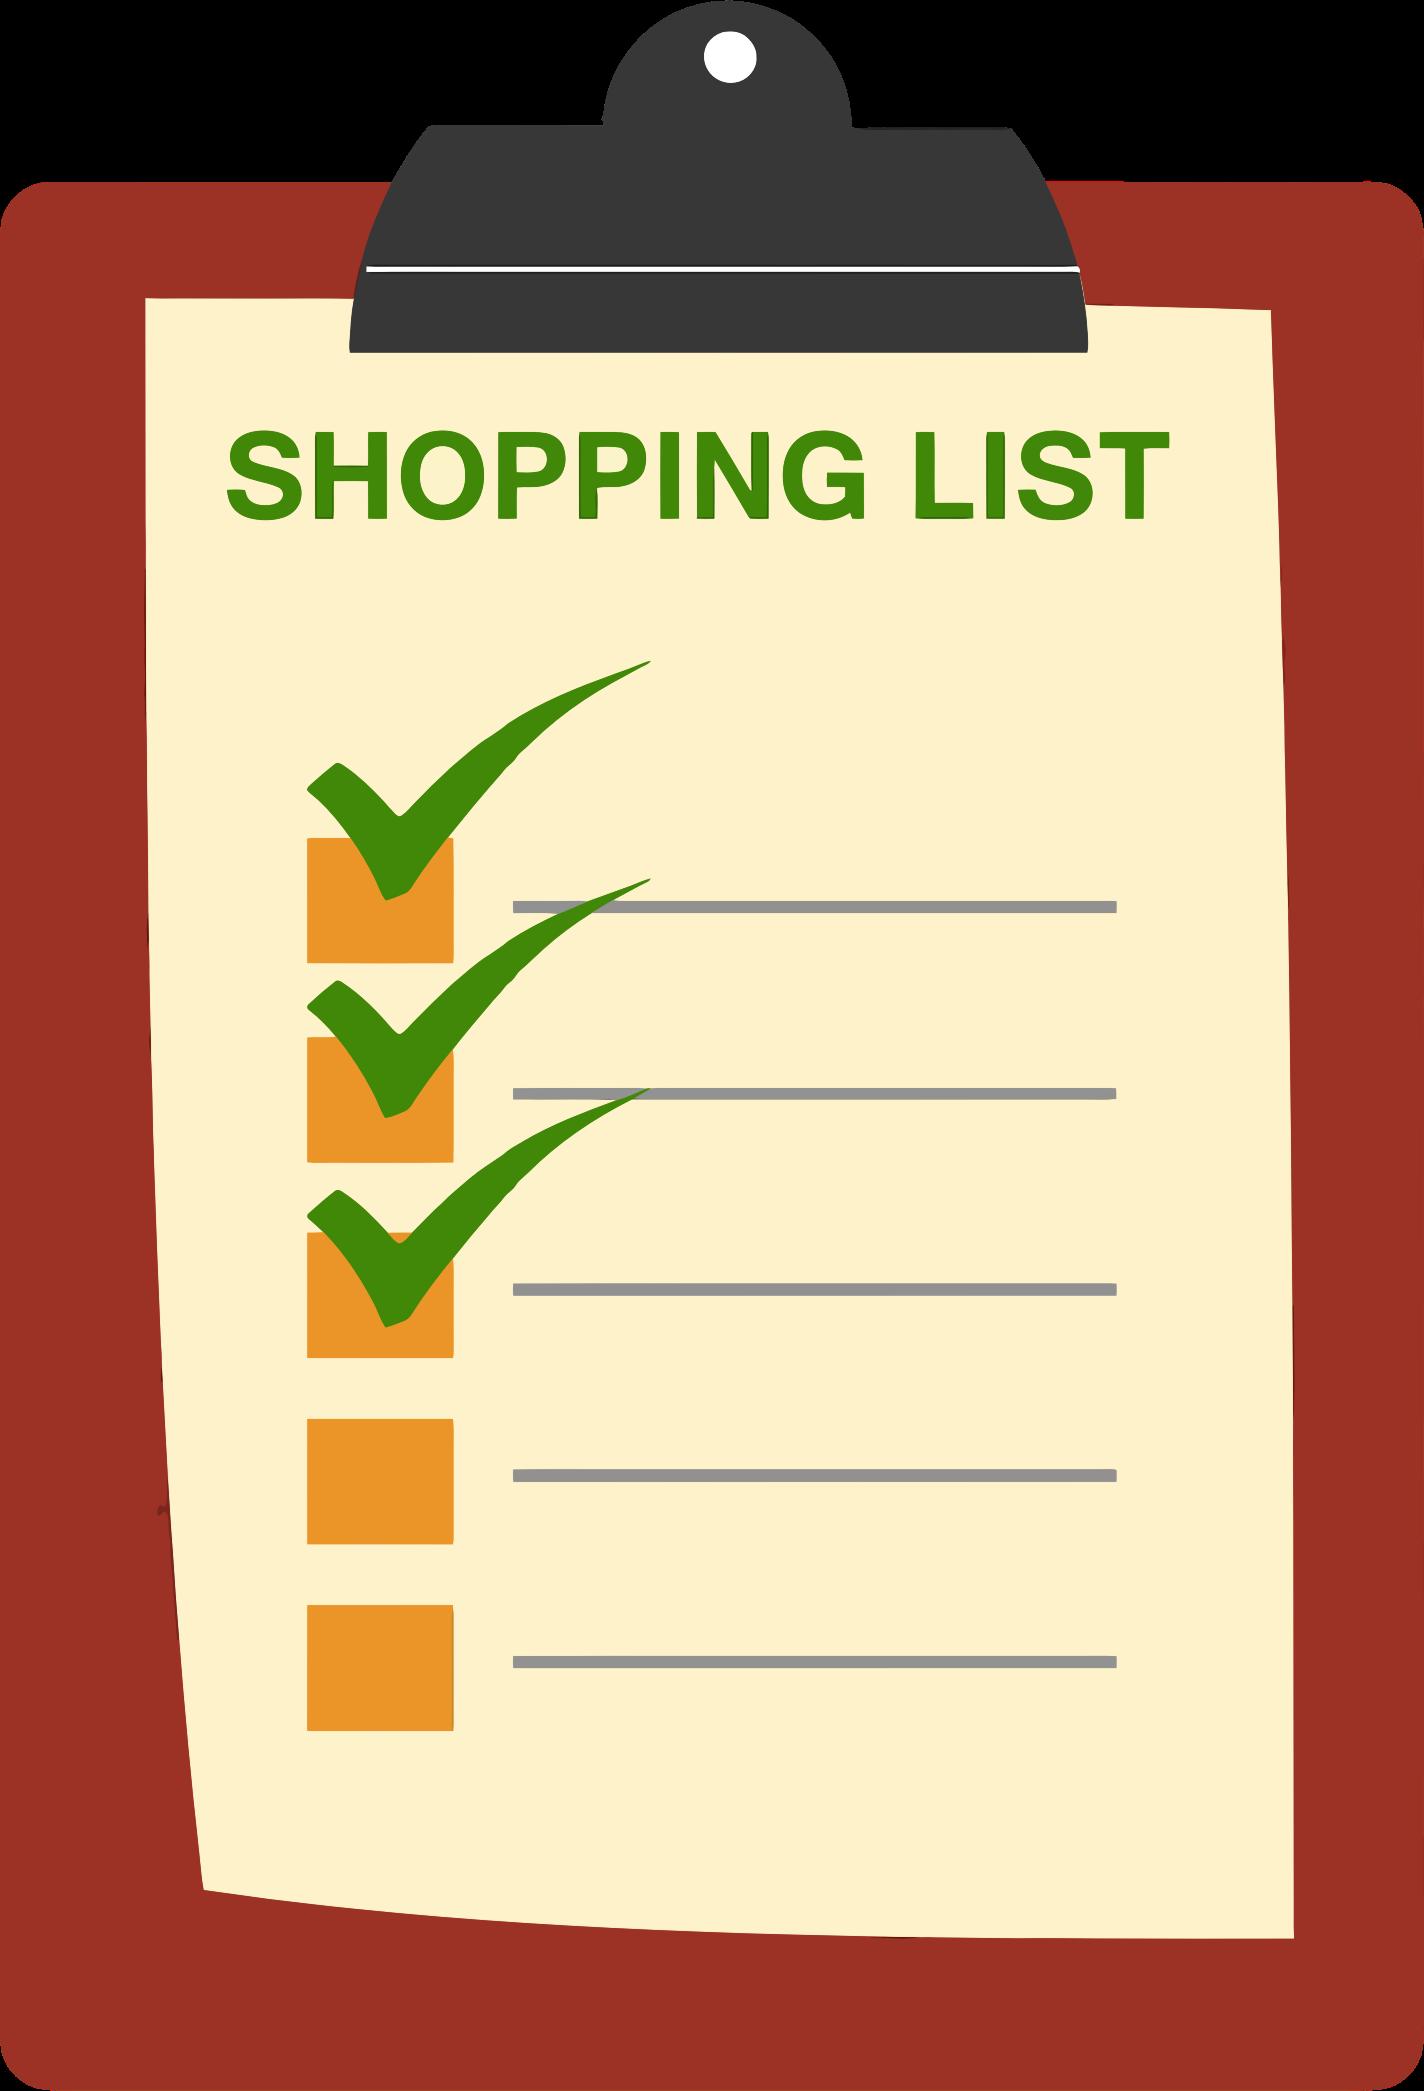 list clip art free clipart panda free clipart images rh clipartpanda com clipart checklist to do list clipart